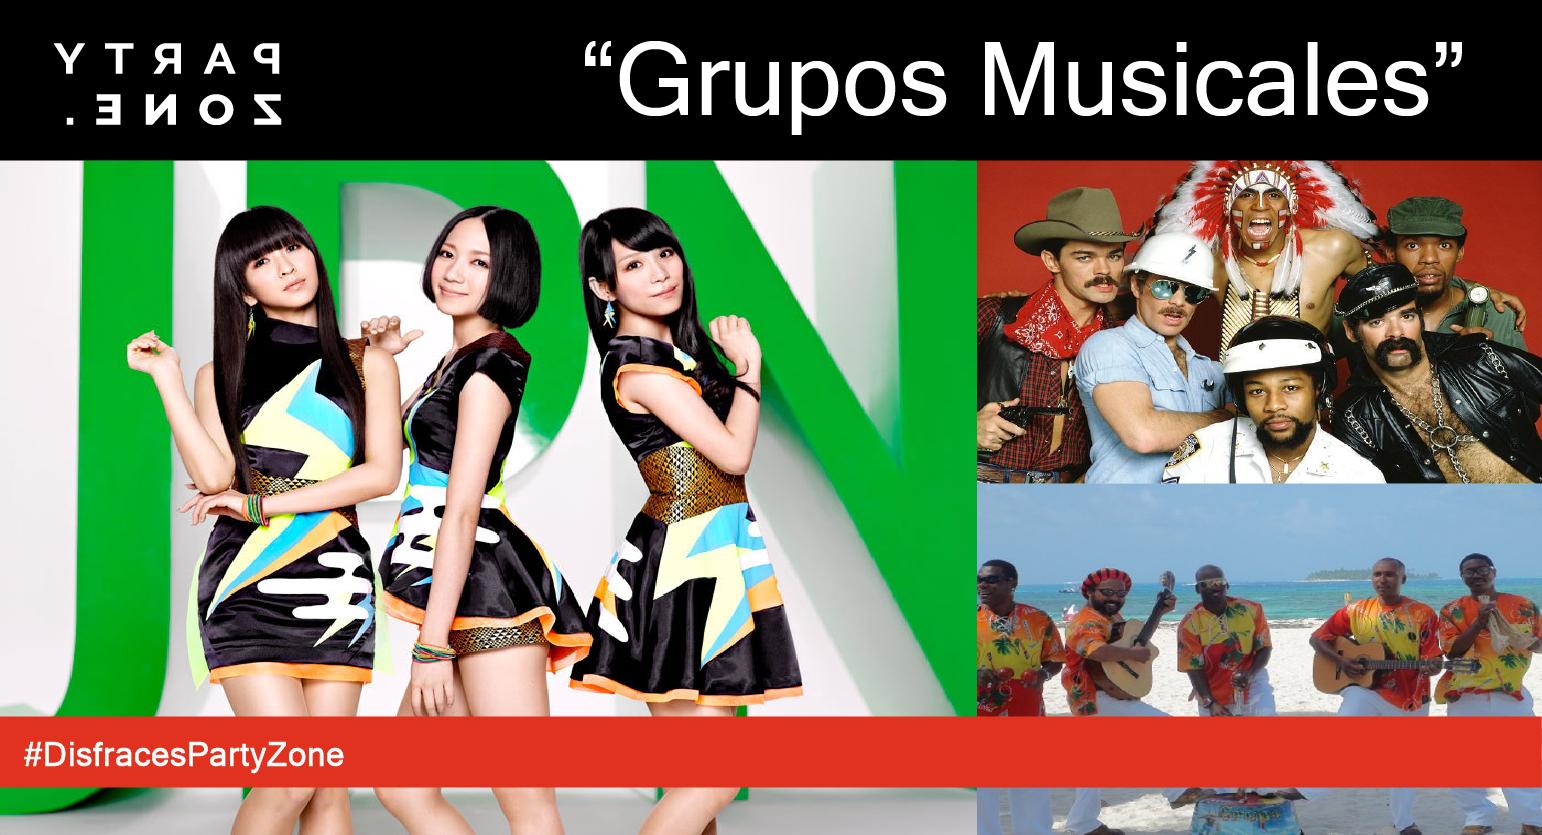 Disfraces para Grupos Musicales